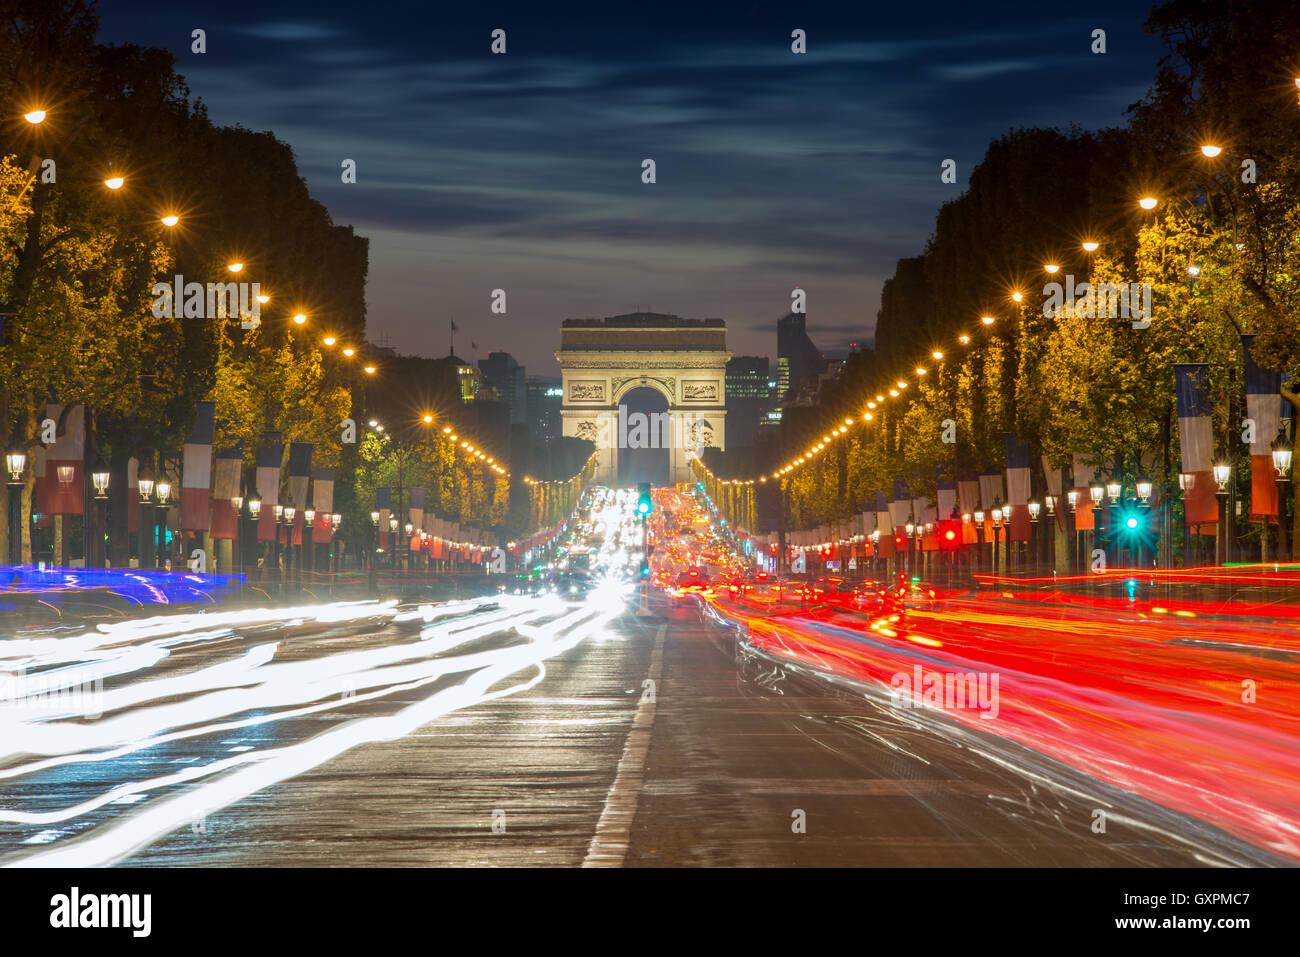 Arc de triumph Paris city at sunset, France. Champs Elysees street at night in Paris, France. - Stock Image